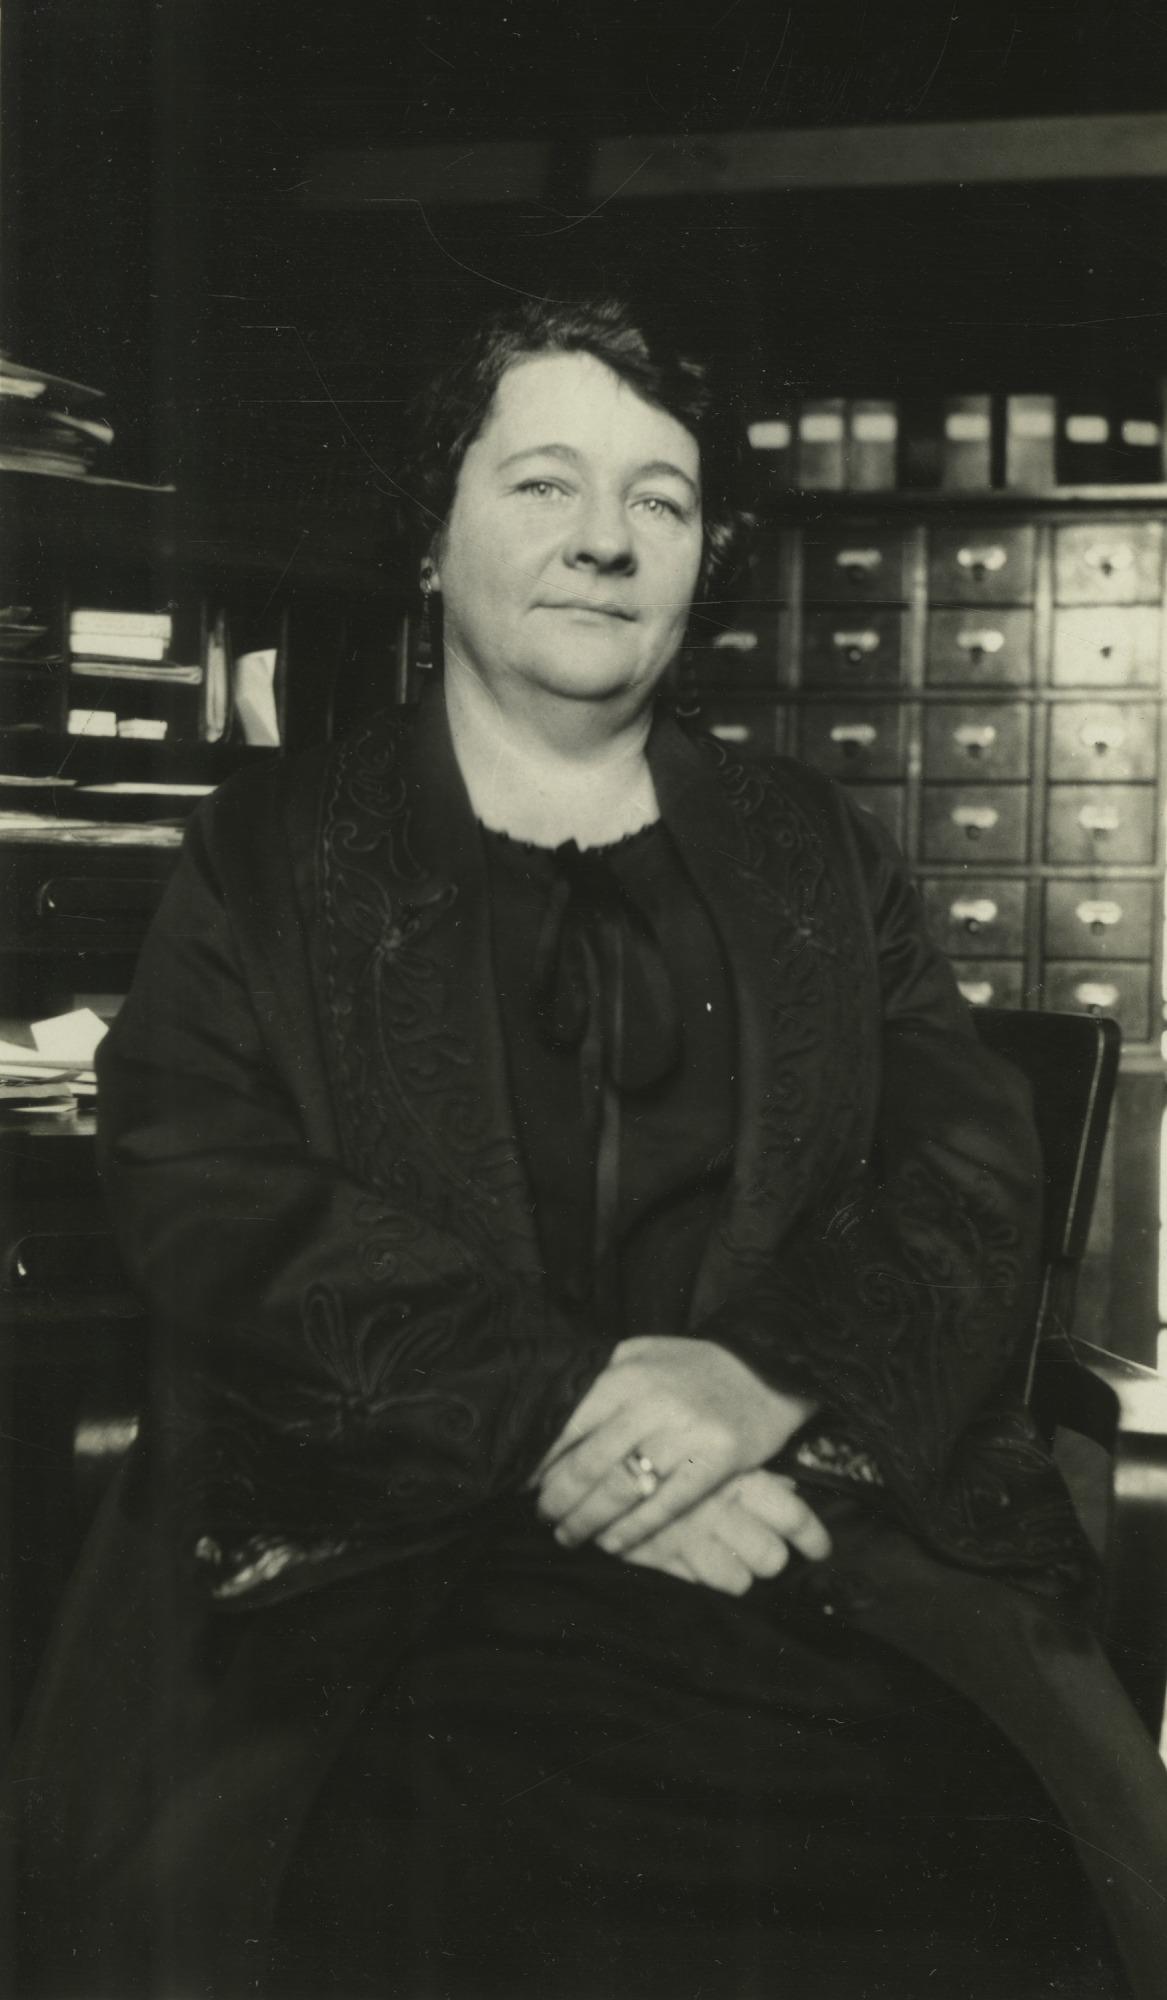 Helene F. Ziska (b. 1893), Smithsonian Institution Archives, SIA Acc. 90-105 [SIA2010-1643].